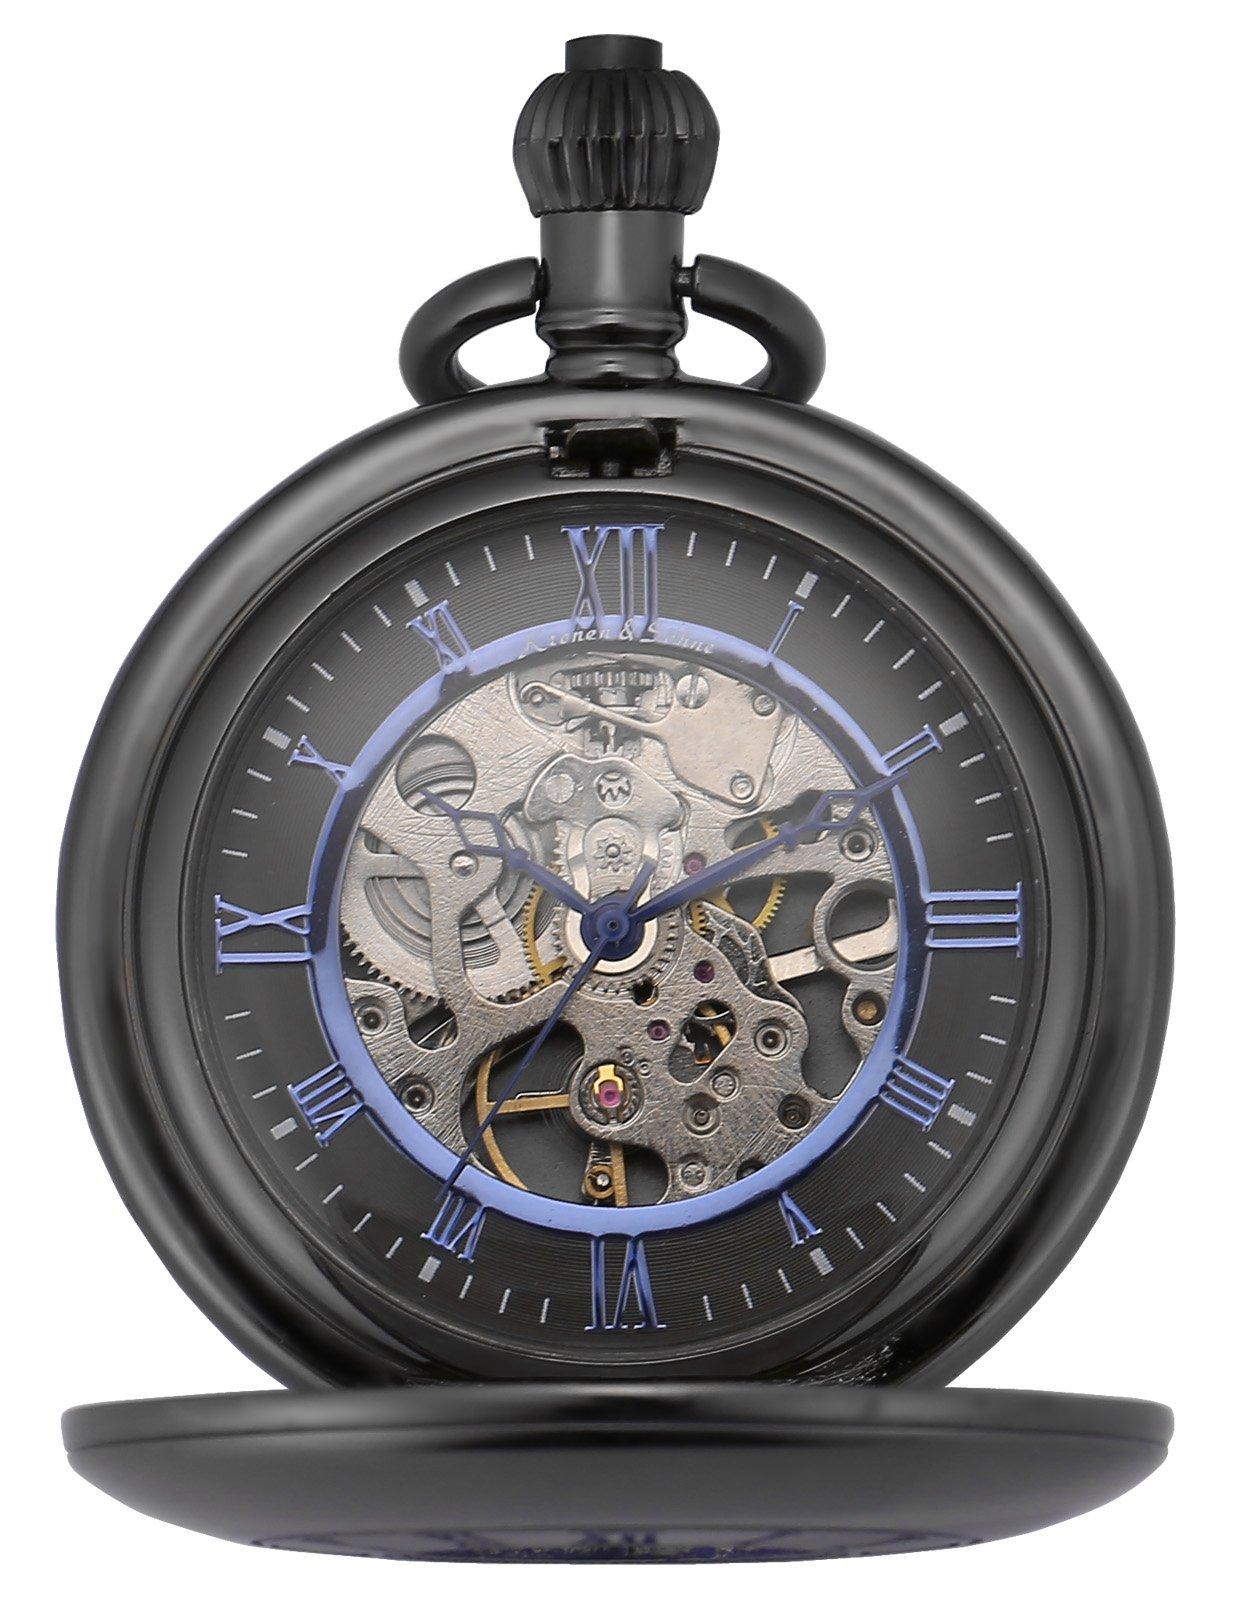 KS Half Hunter Mechanical Hand Wind Classic Pocket Watch Black Alloy Case KSP090